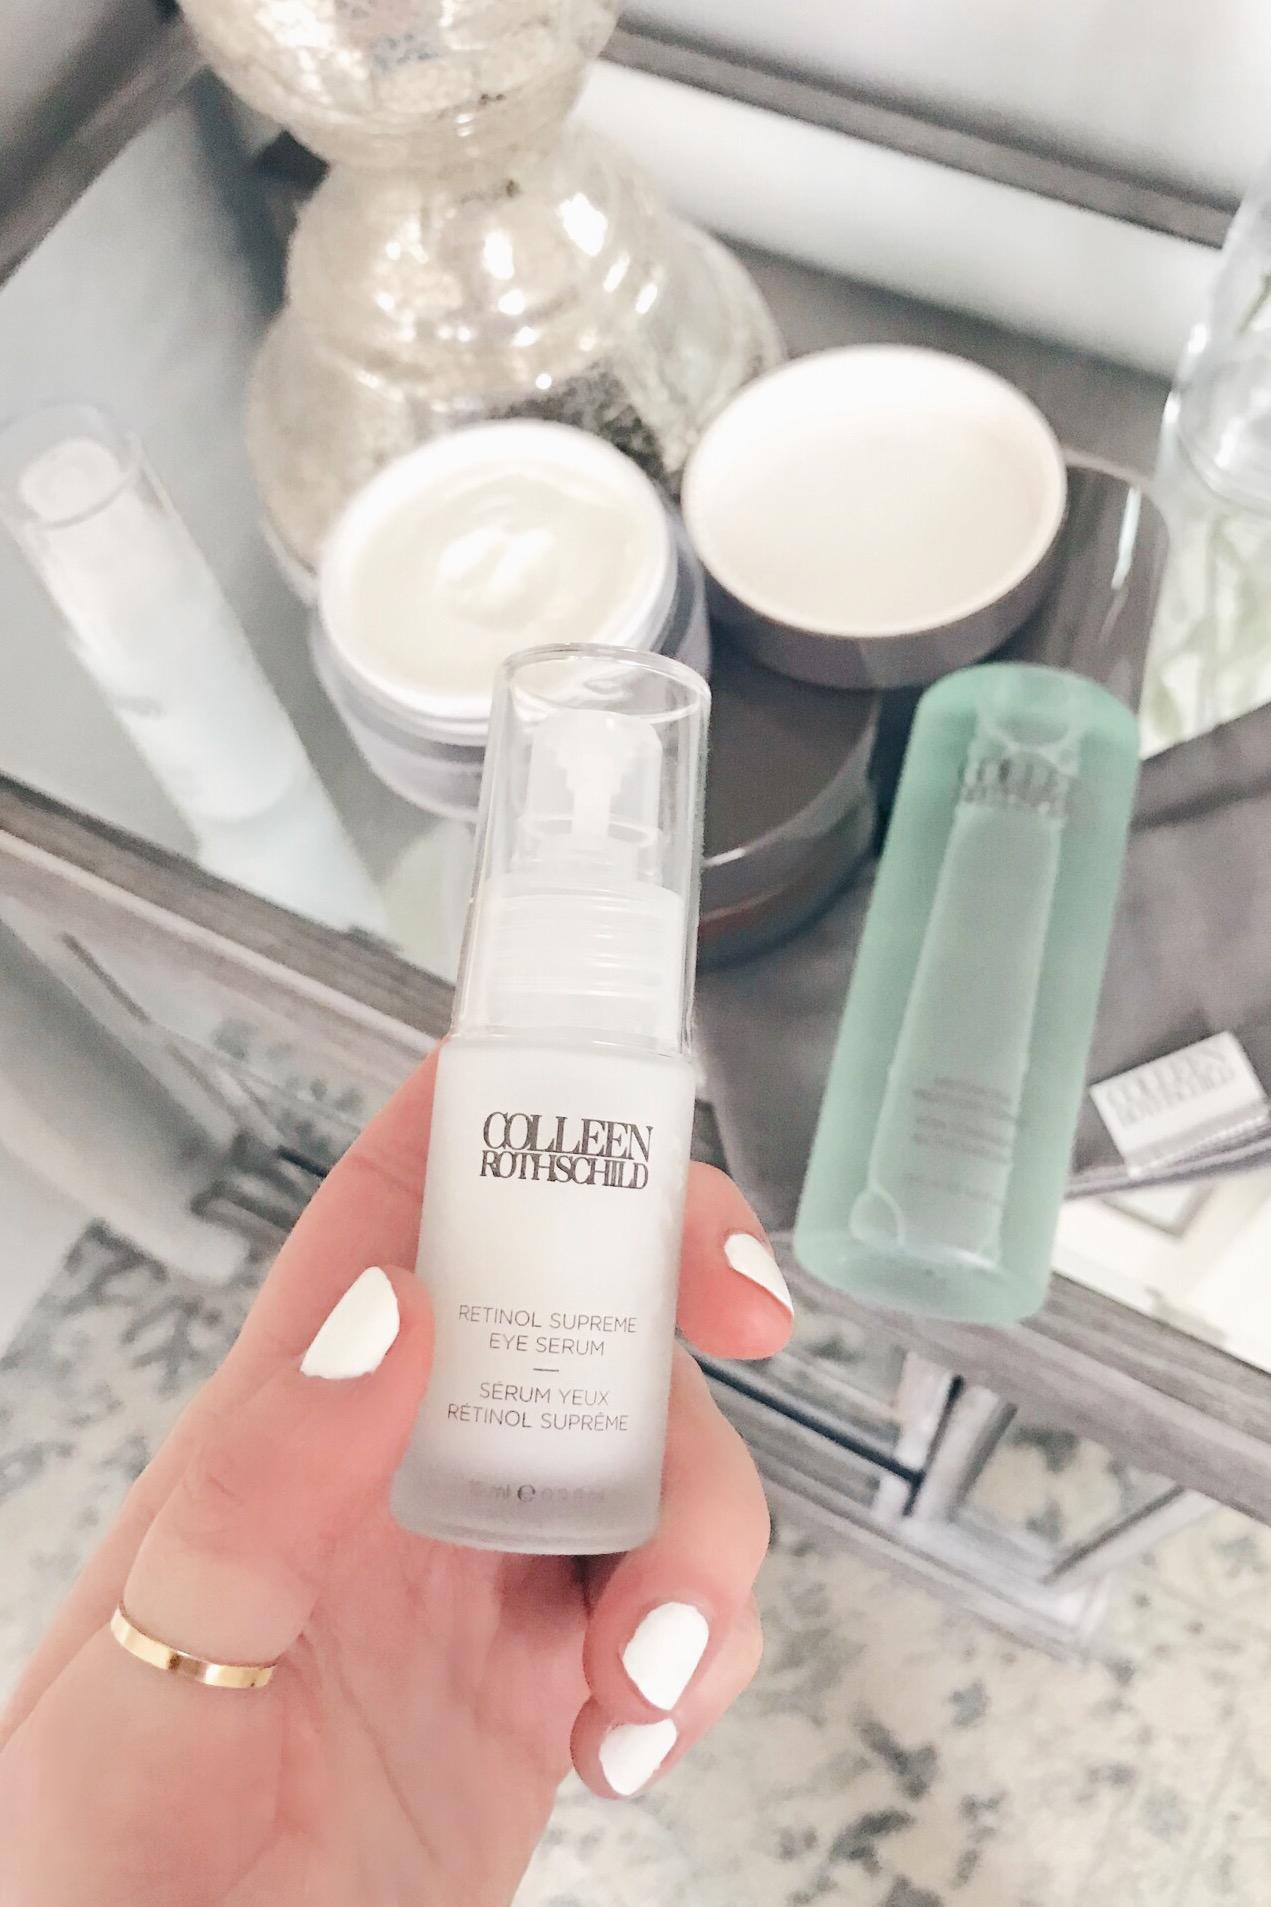 colleen rothschild beauty product review - retinol eye serum on pinteresting plans blog